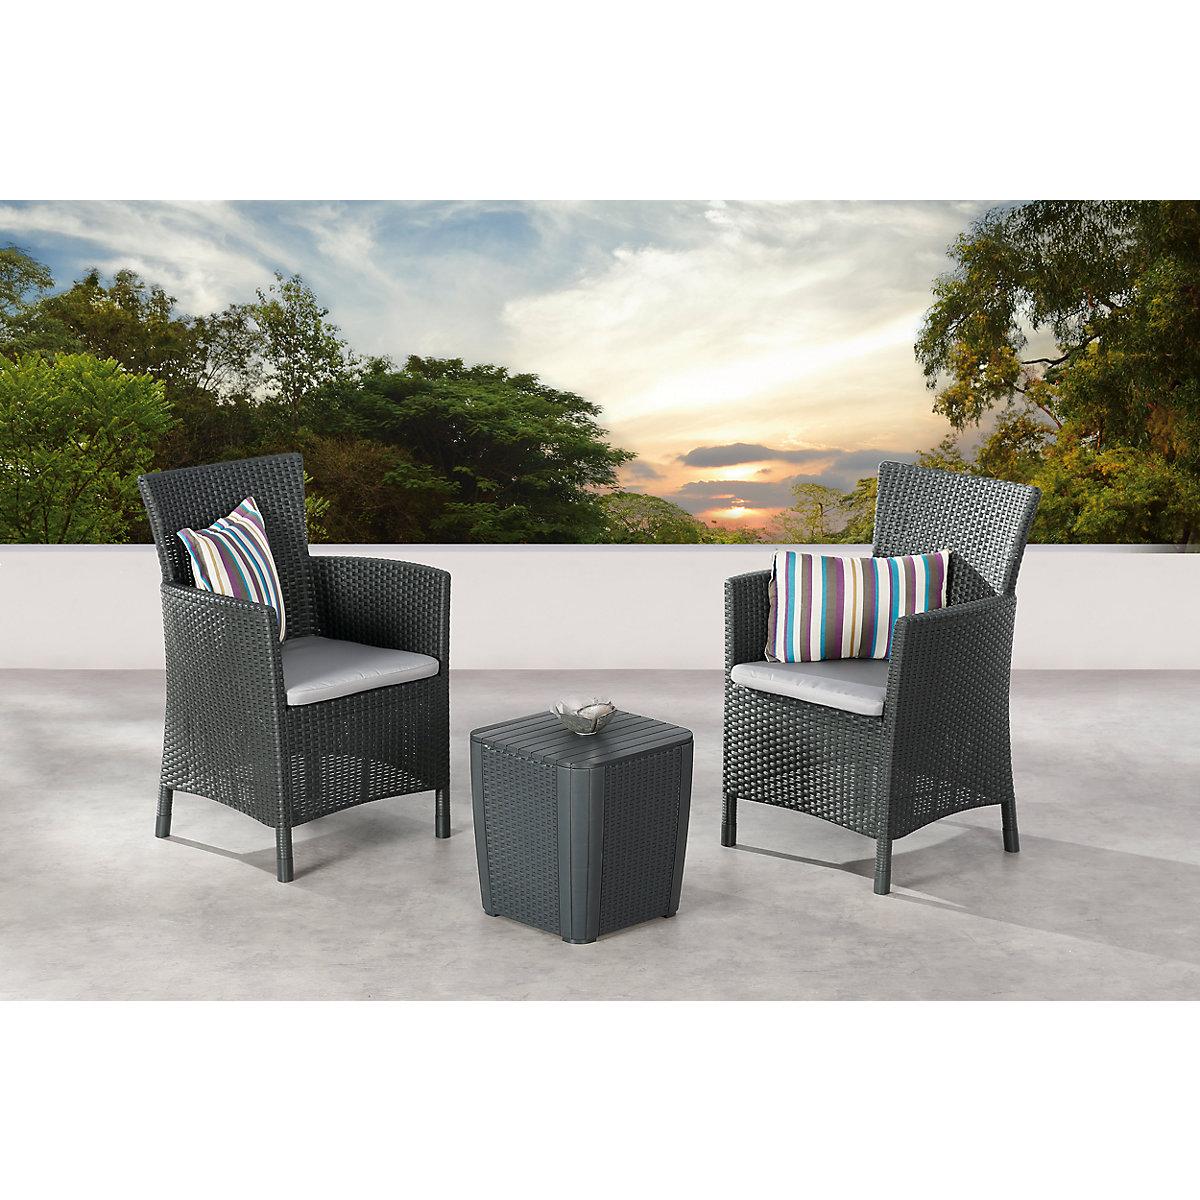 5 tlg polyrattan balkon sitzgruppe clara grau yomonda. Black Bedroom Furniture Sets. Home Design Ideas